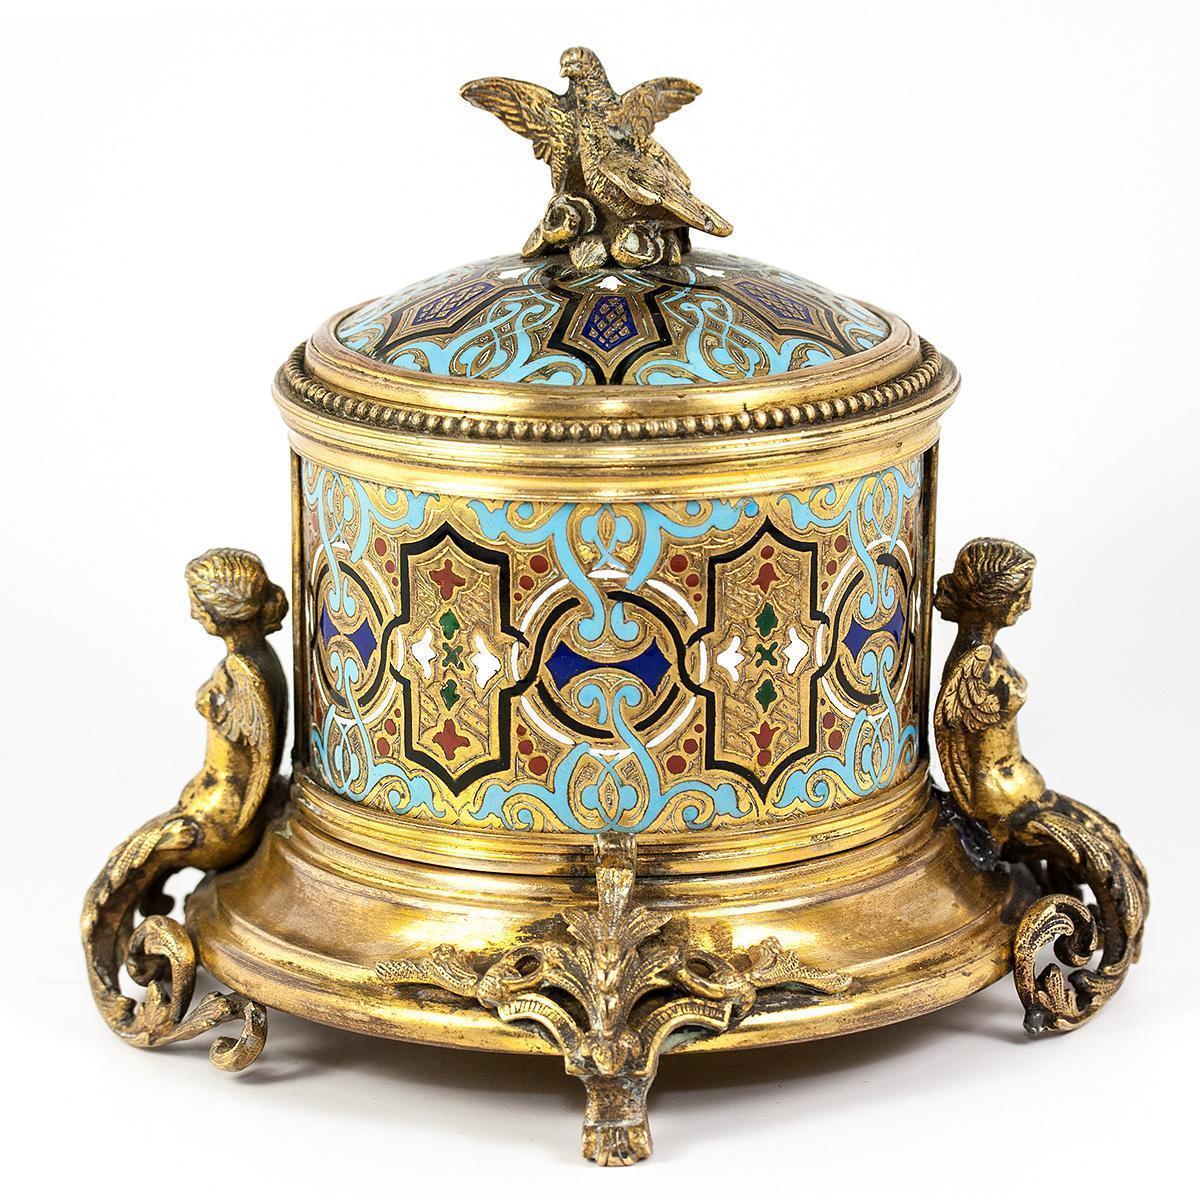 Antique French or Russian Champleve Enamel Box, Casket, Cigar? Server - Superb!